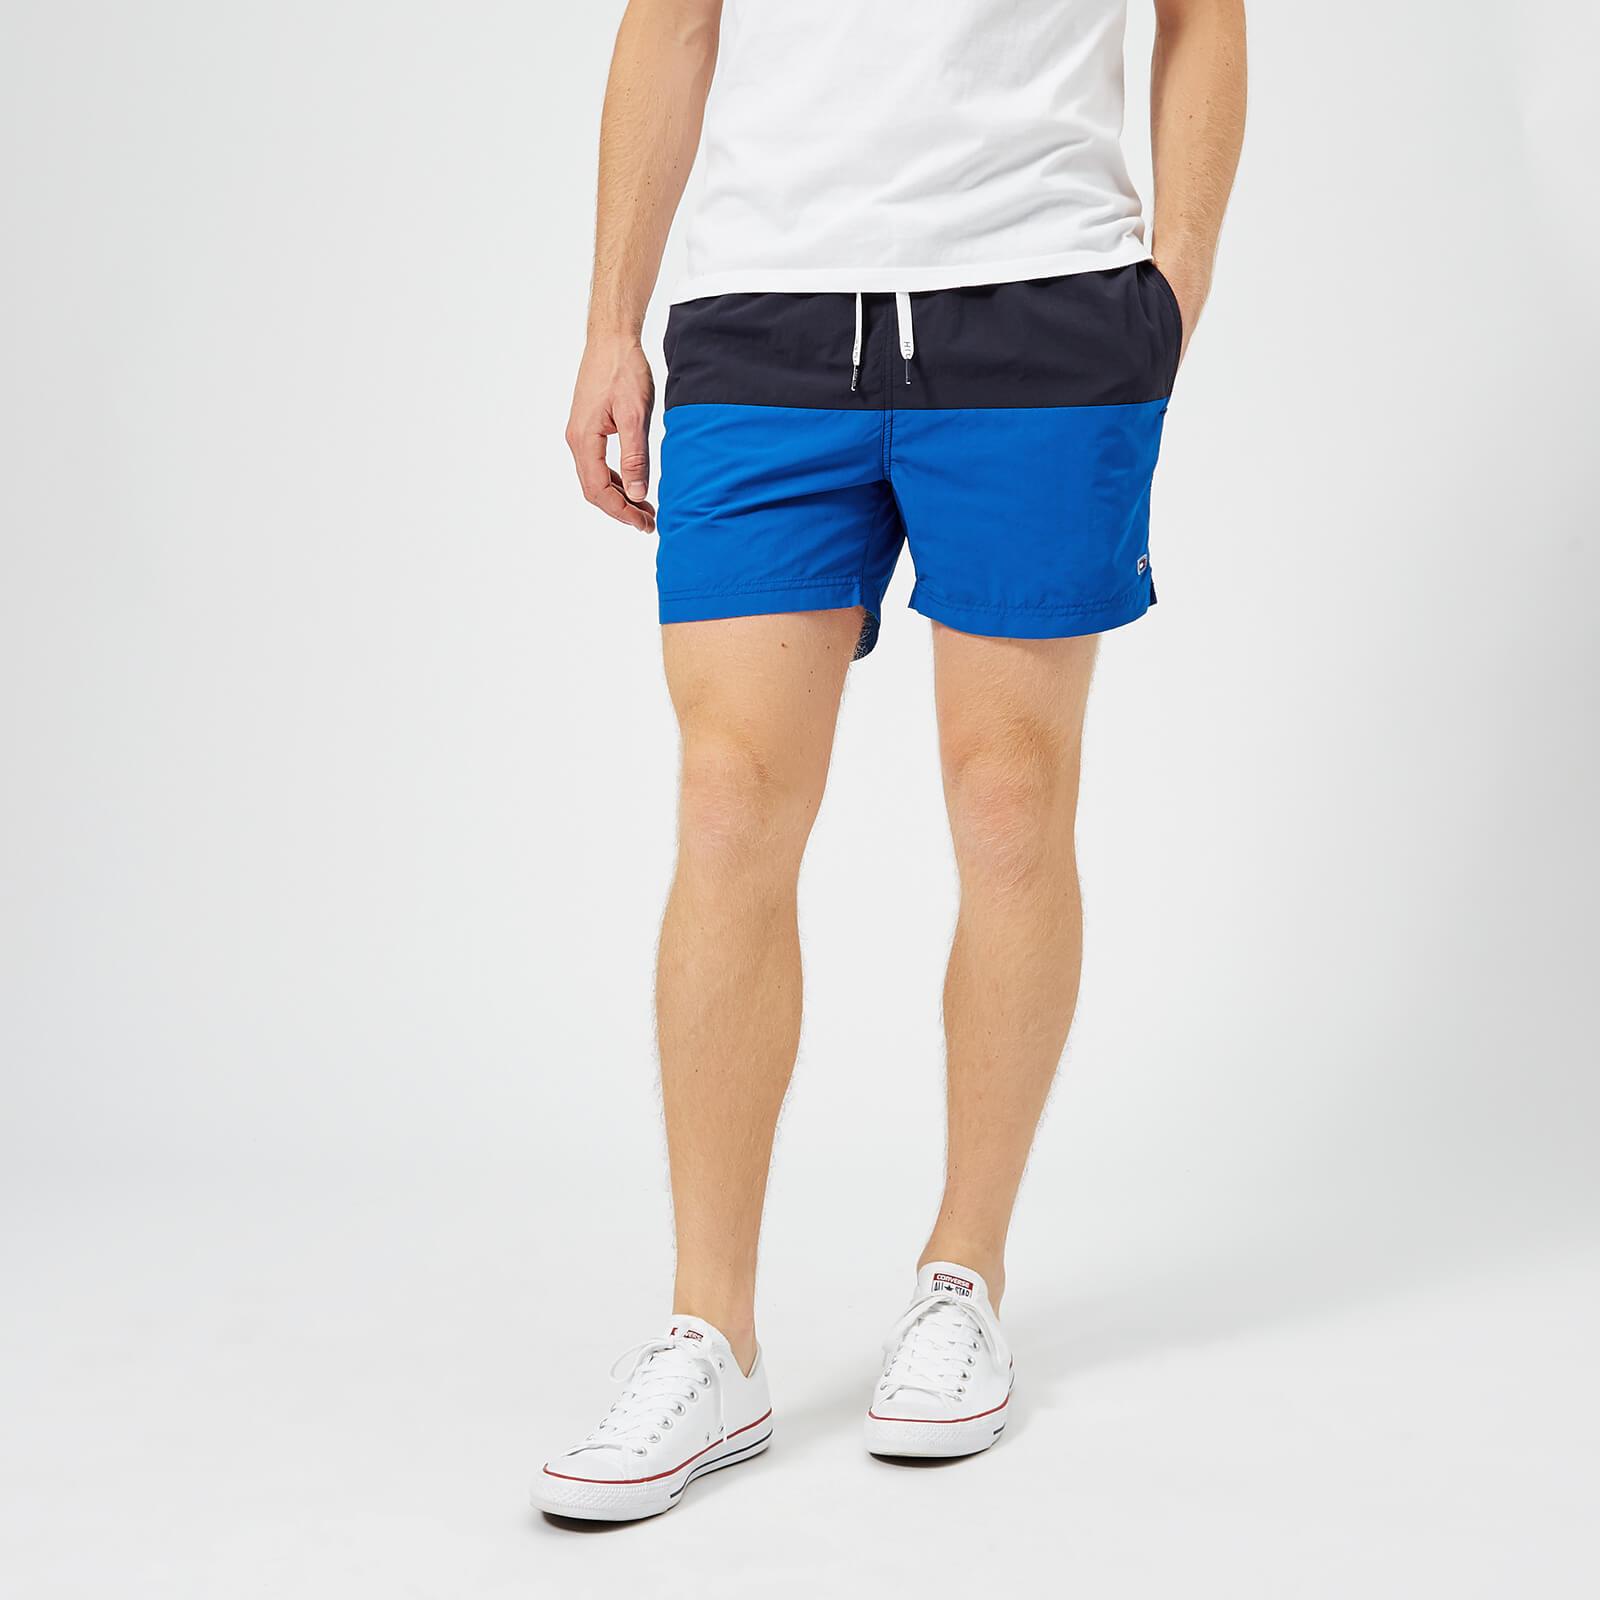 213fccc2 Tommy Hilfiger Men's Short Drawstring Swim Shorts - Navy Blazer/Lapis Blue Mens  Underwear   TheHut.com